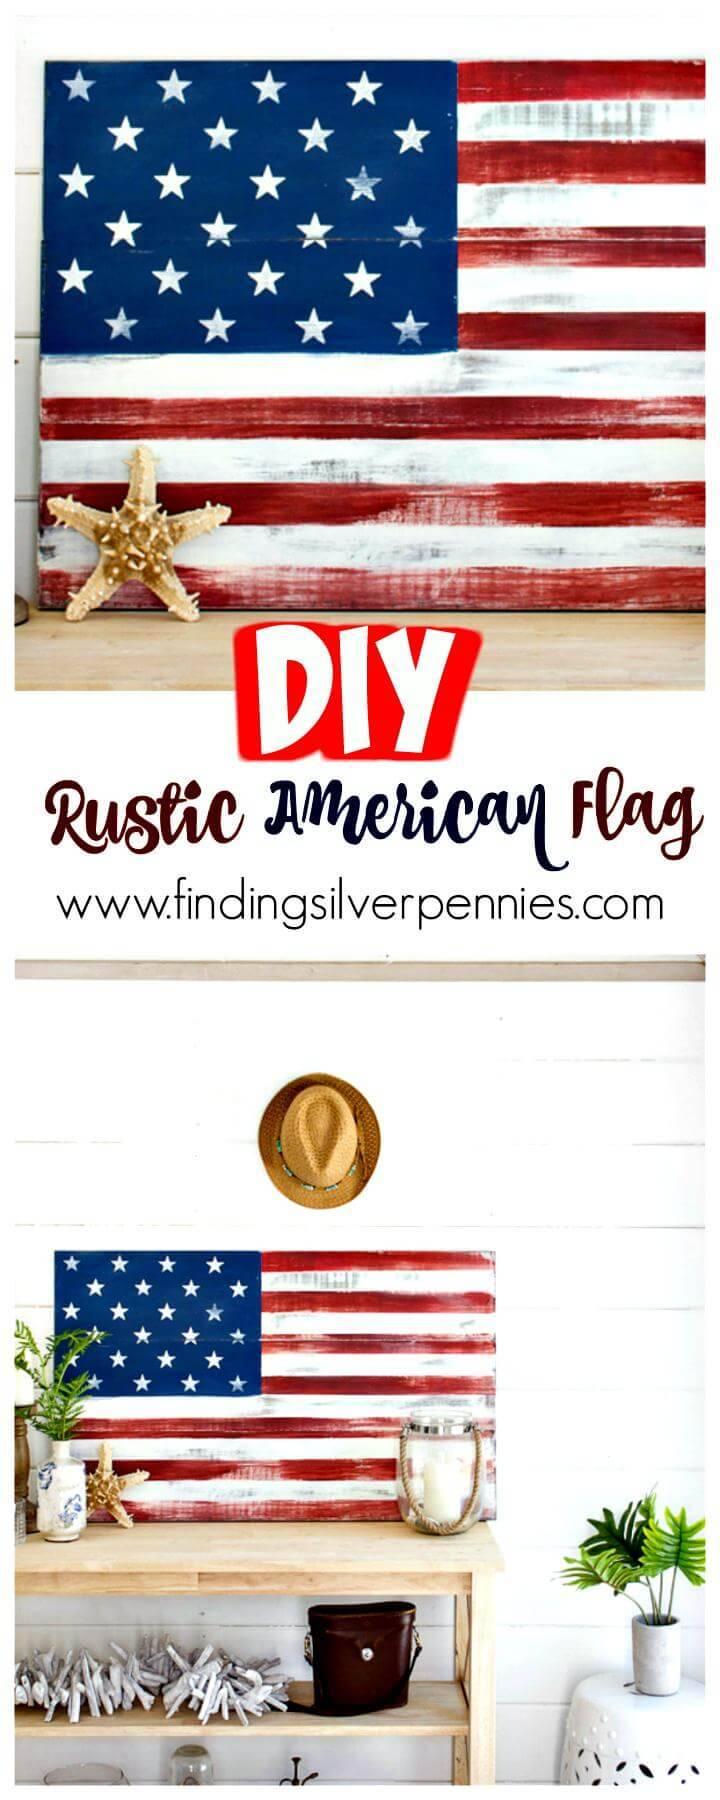 DIY Rustic Amercian flag